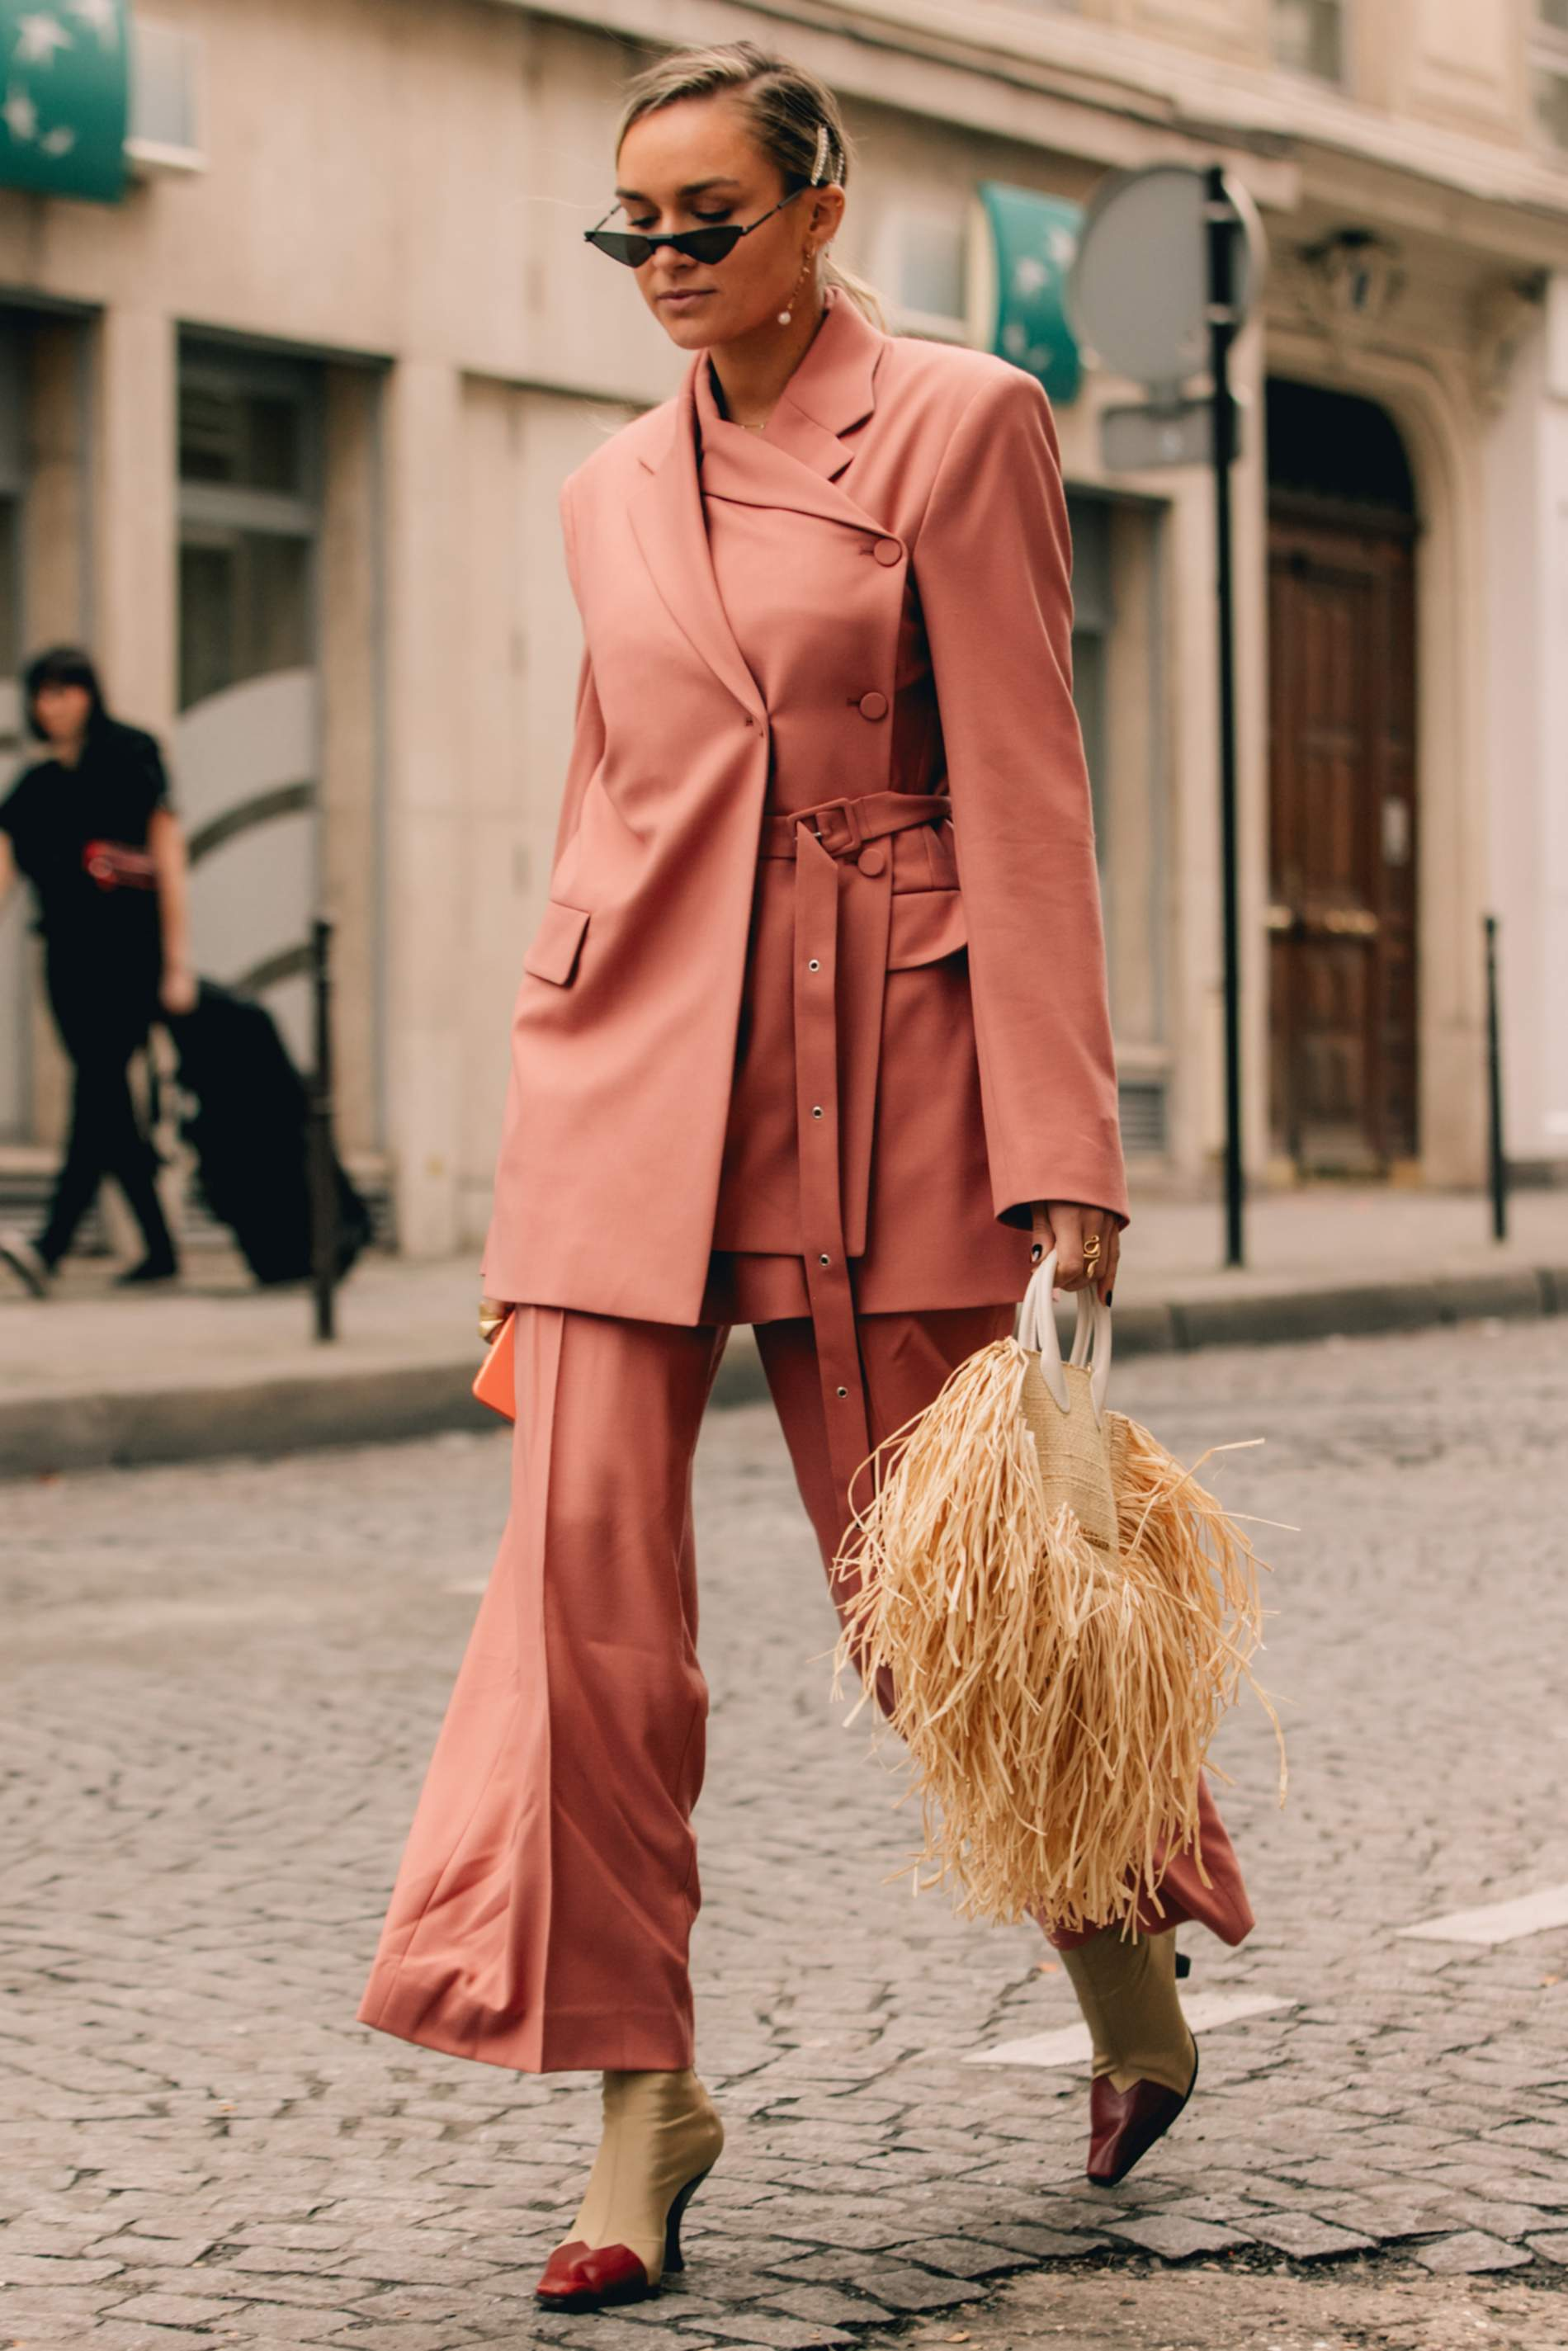 aaca688987f8 Best Dressed  Paris Fashion Week FW19 Street Style